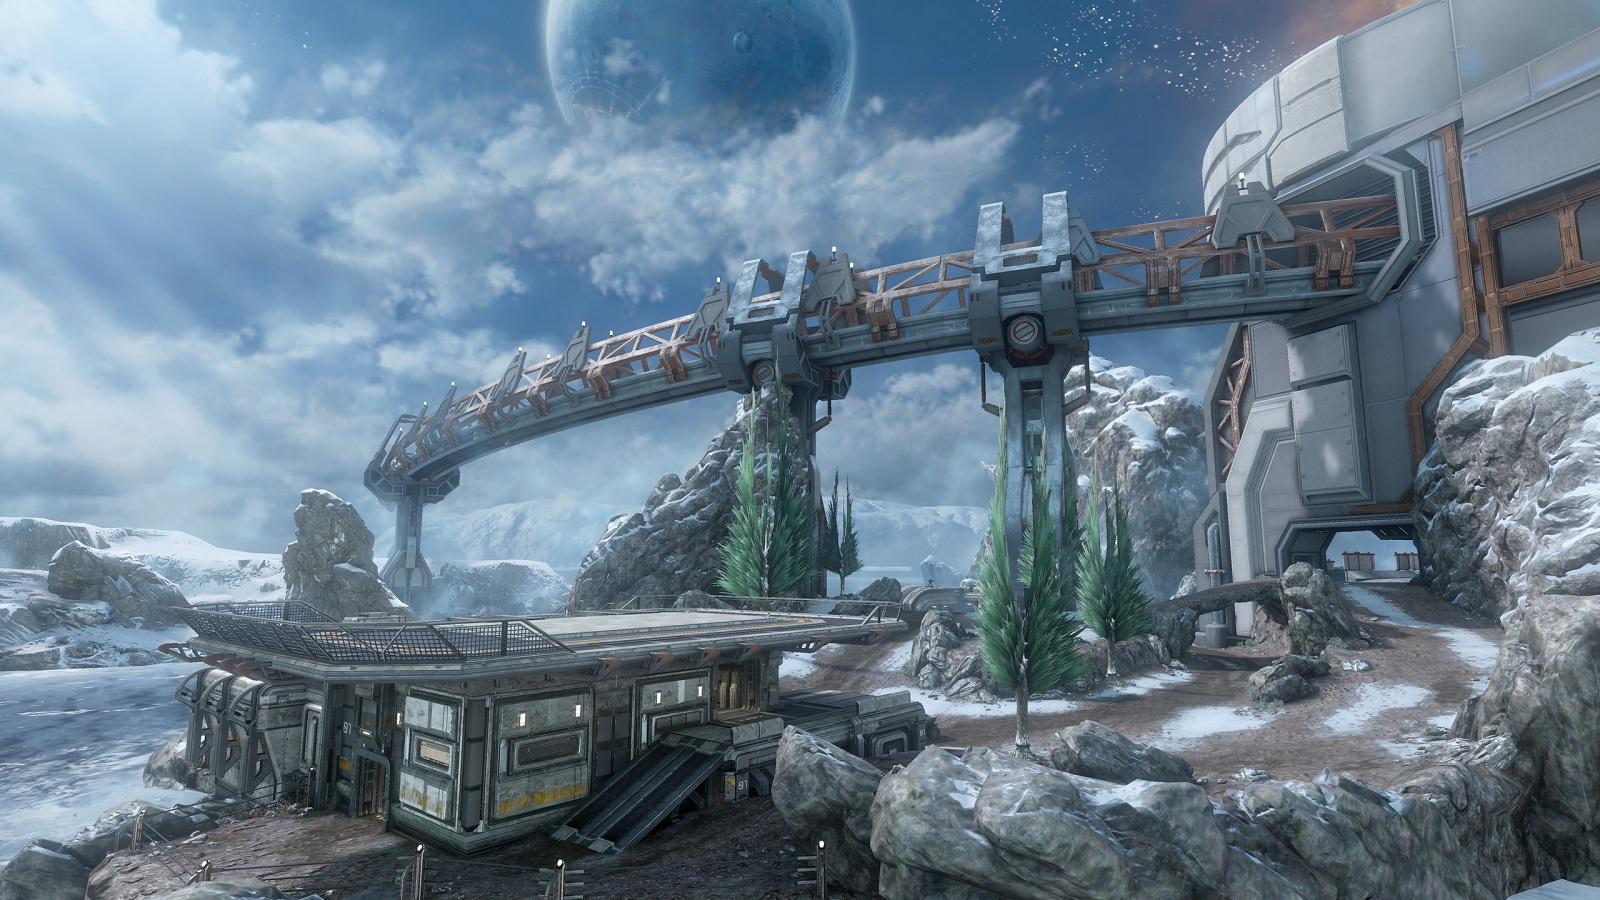 Halo 4 Forge Tutorial Dominion Setup Video Halo Diehards